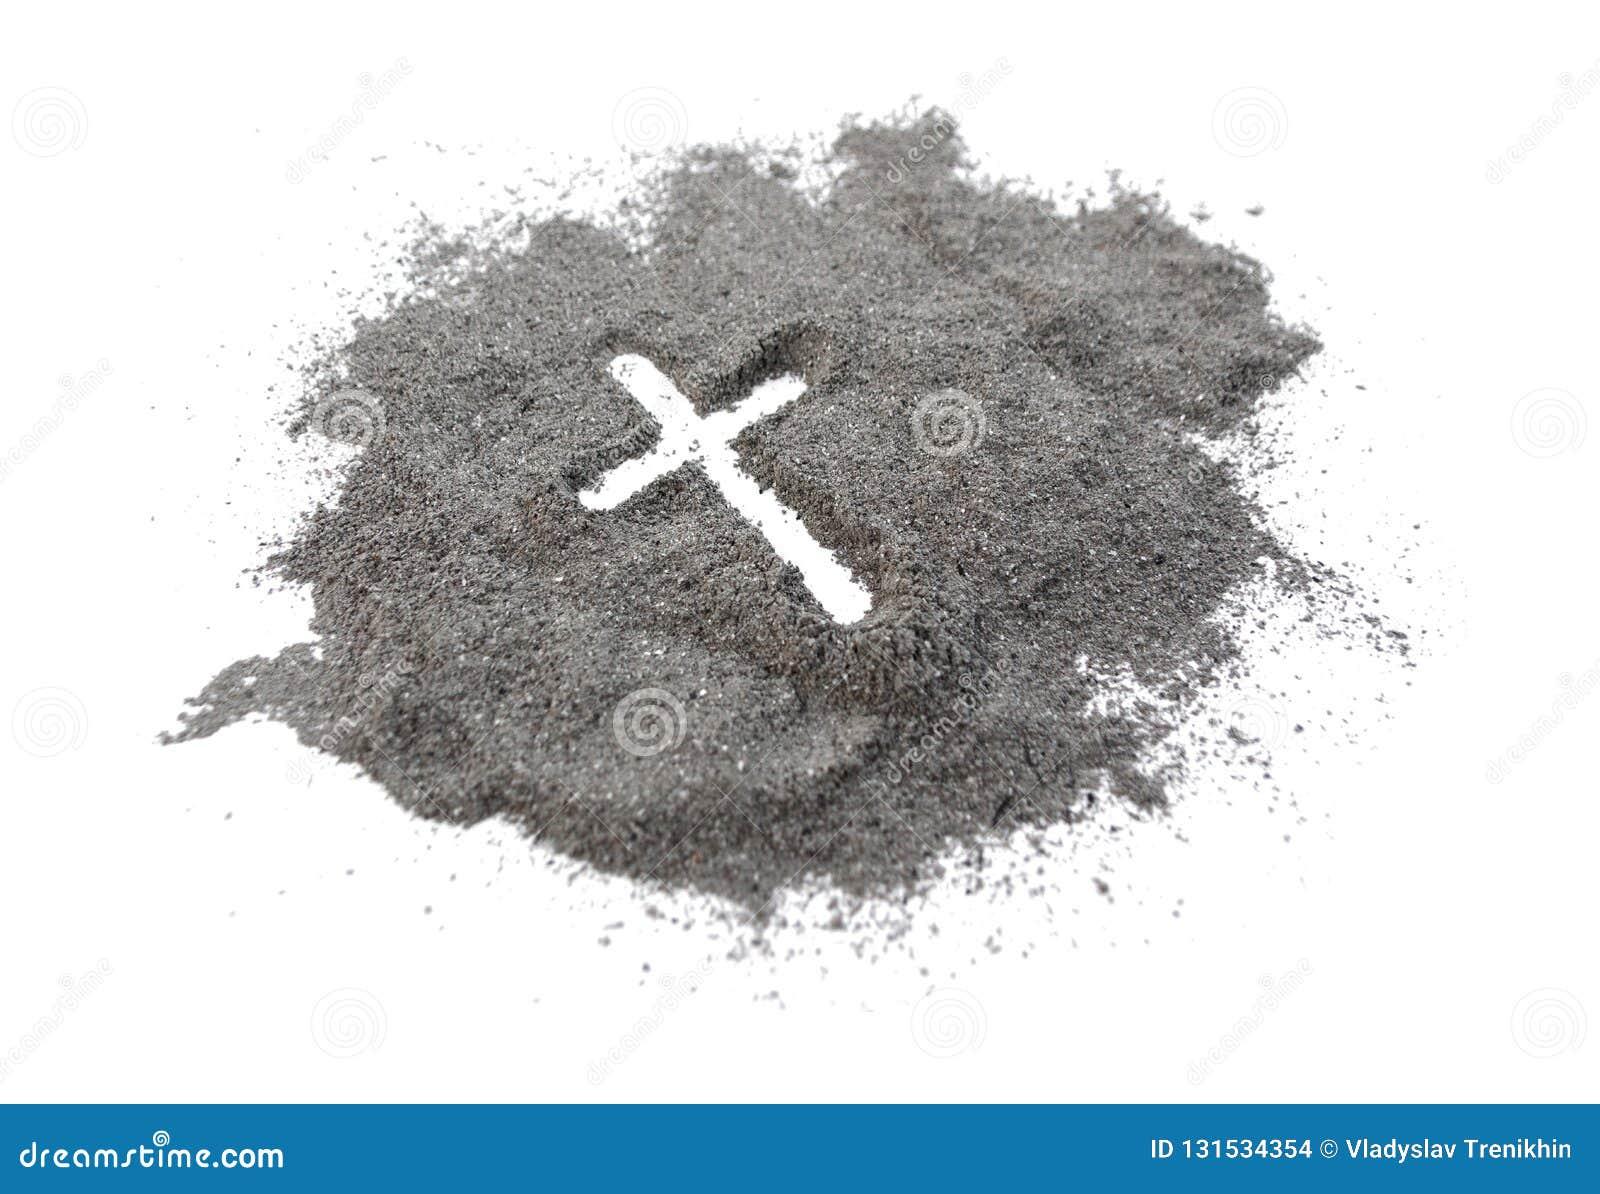 Christelijke kruis of kruisbeeldtekening in as, stof of zand als symbool van godsdienst, offer, redemtion, Jesus Christ, aswoensd